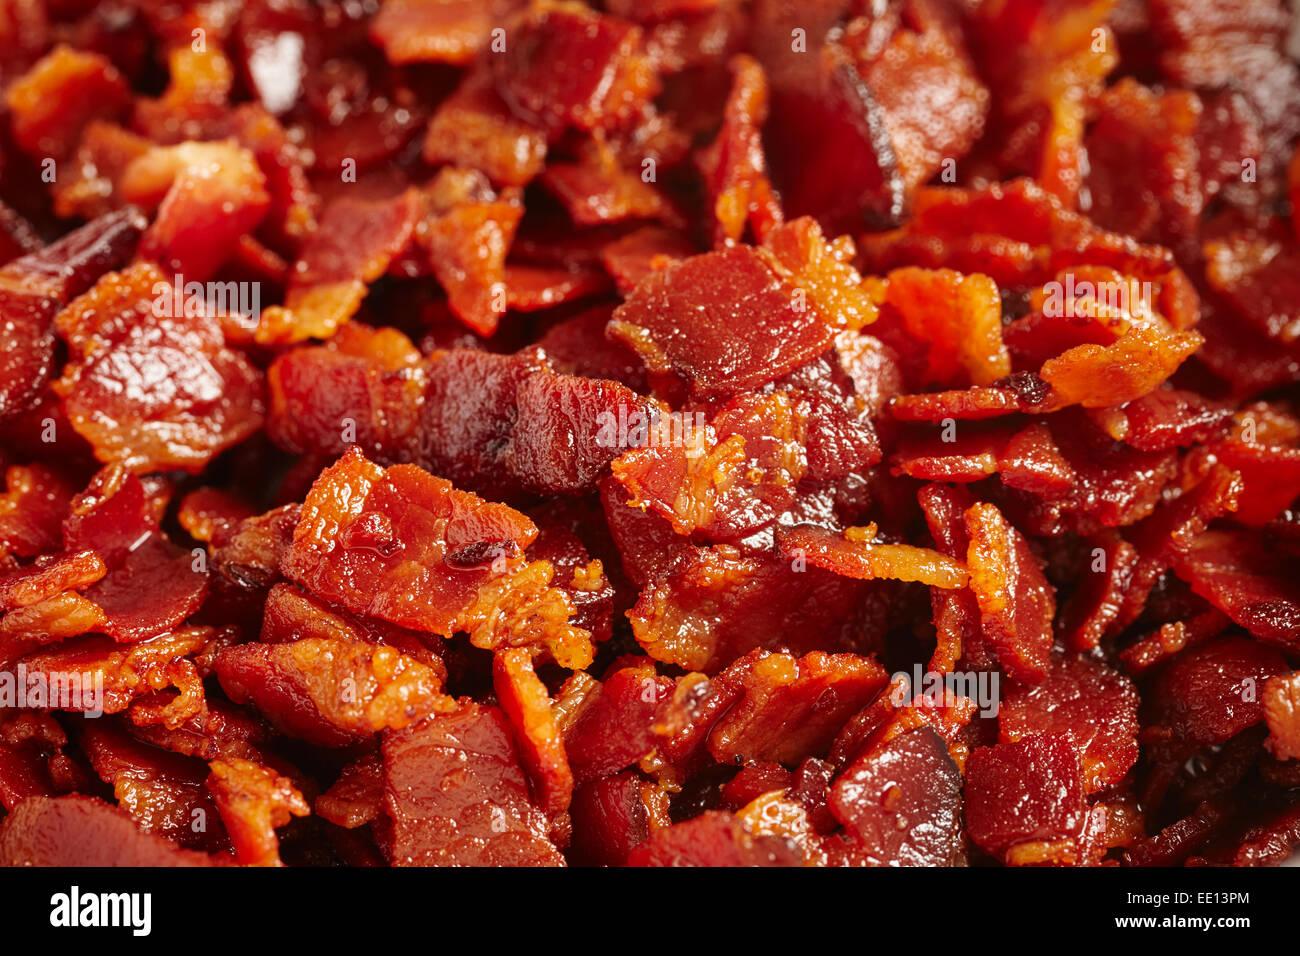 chopped bacon frying Stock Photo - Alamy